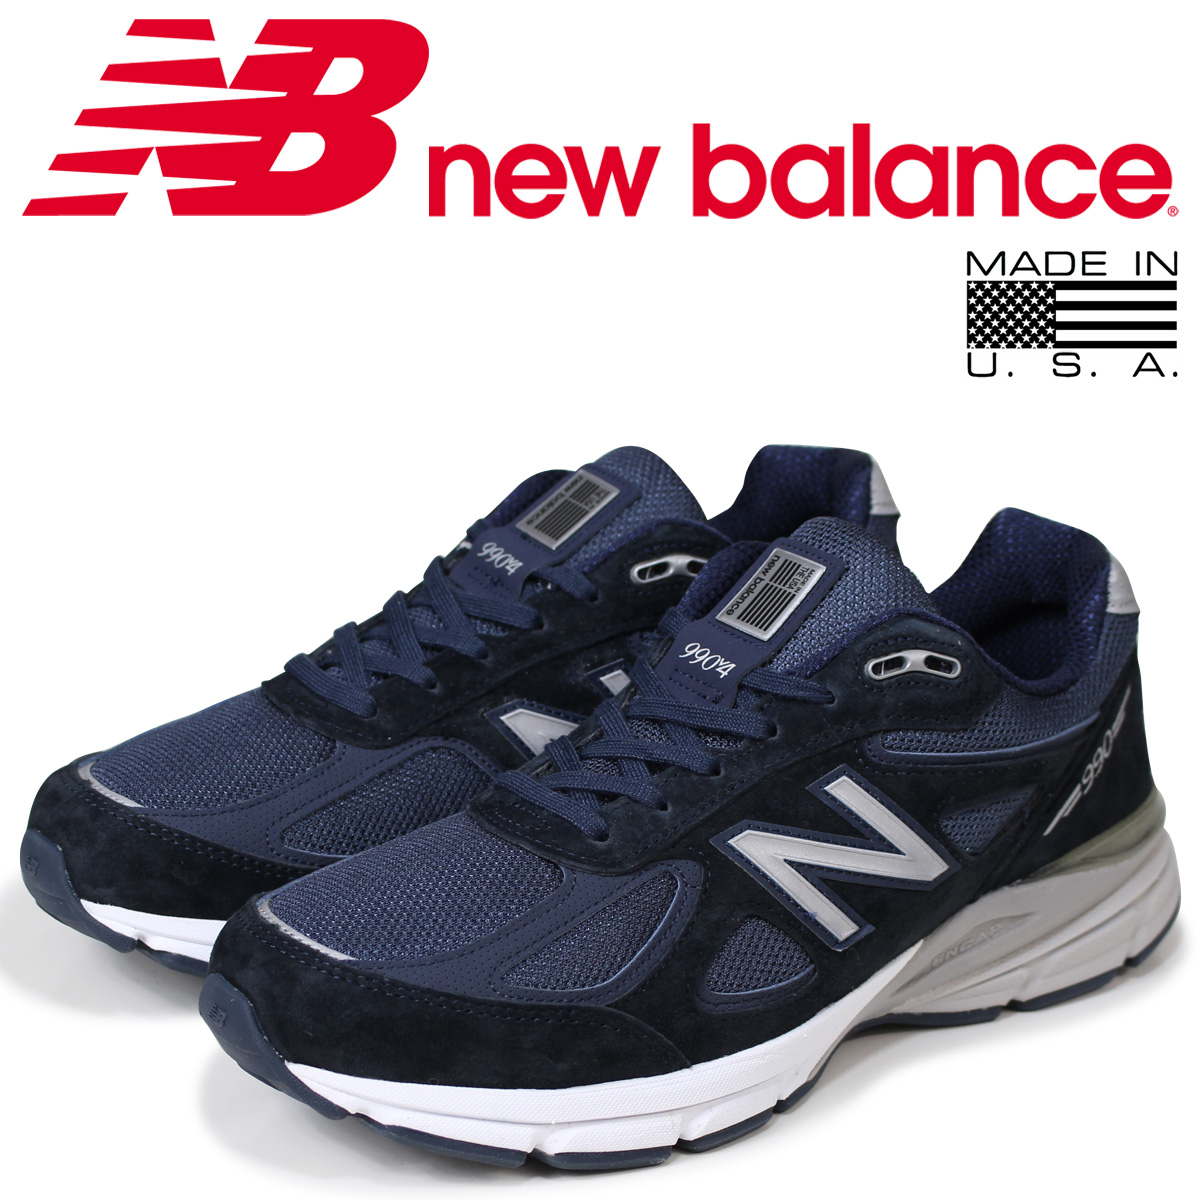 new balance 990 メンズ ニューバランス スニーカー M990NV4 Dワイズ 靴 ネイビー MADE IN USA